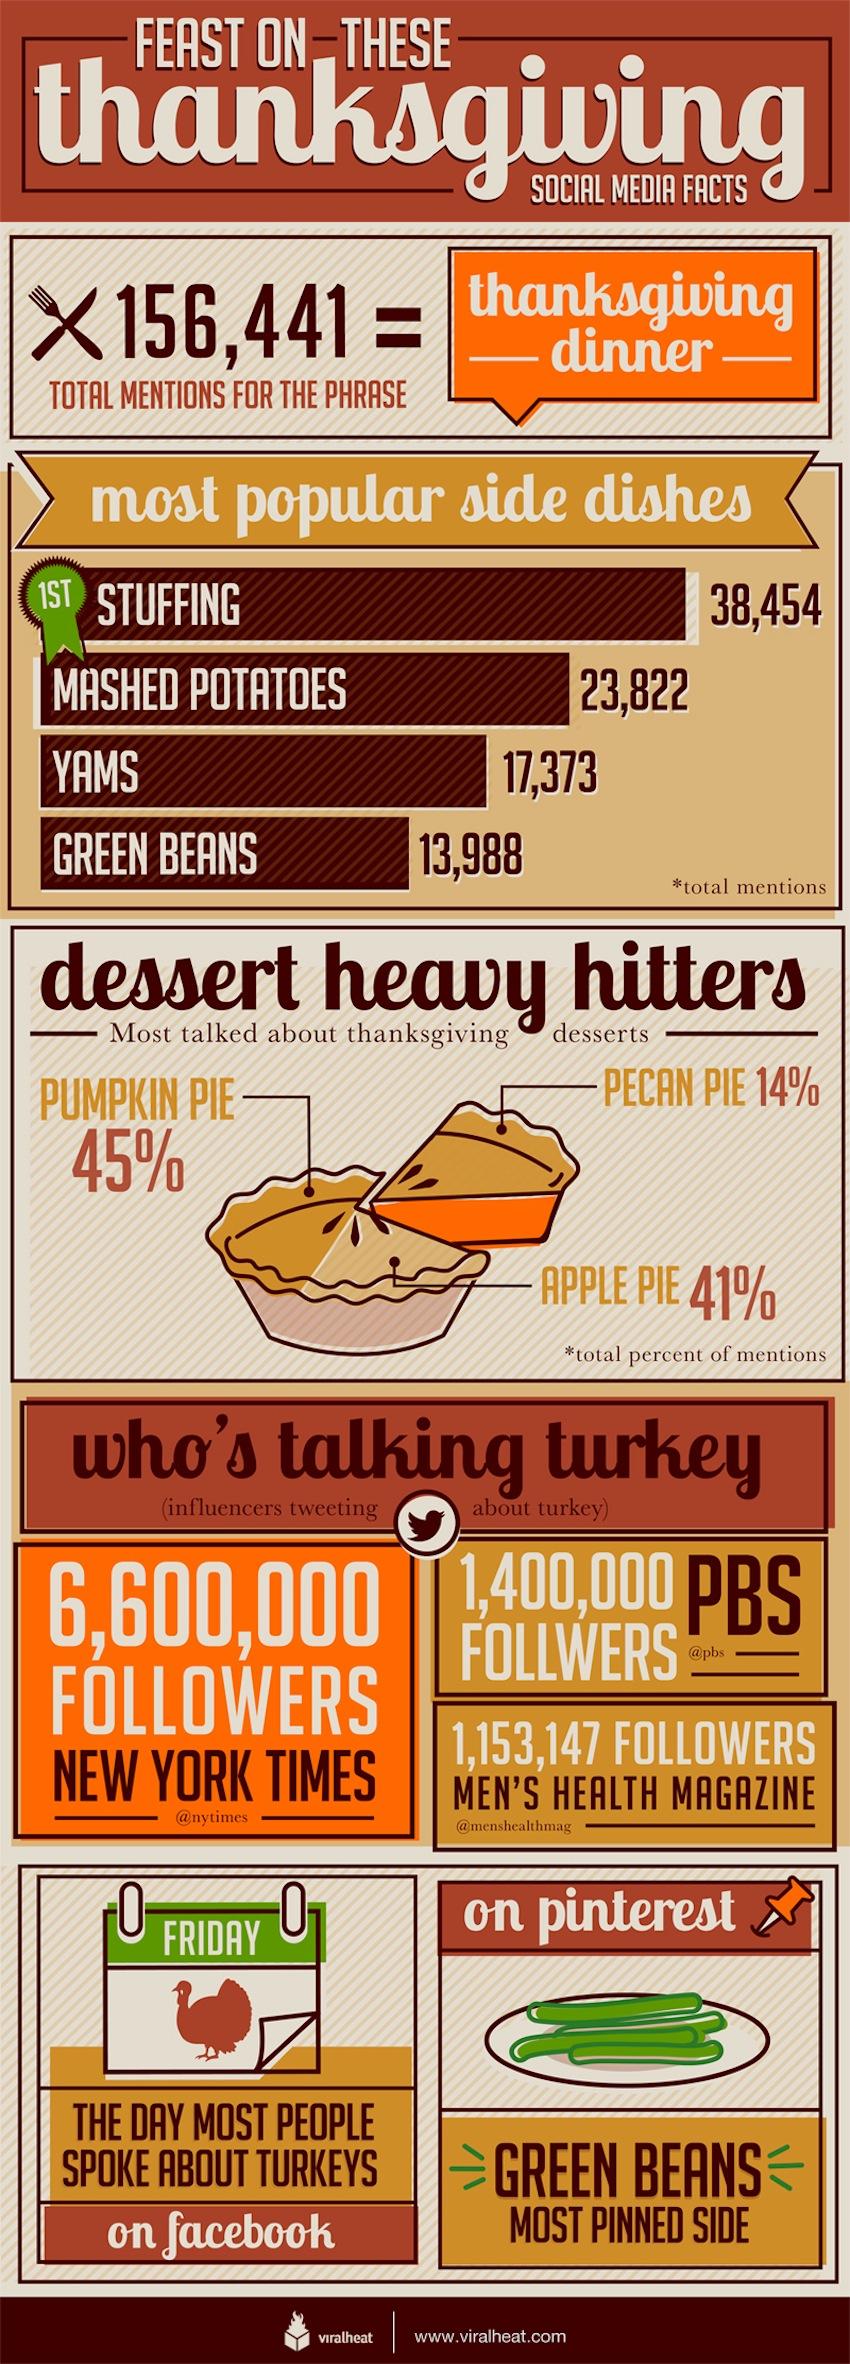 social-media-american-thanksgiving-infographic